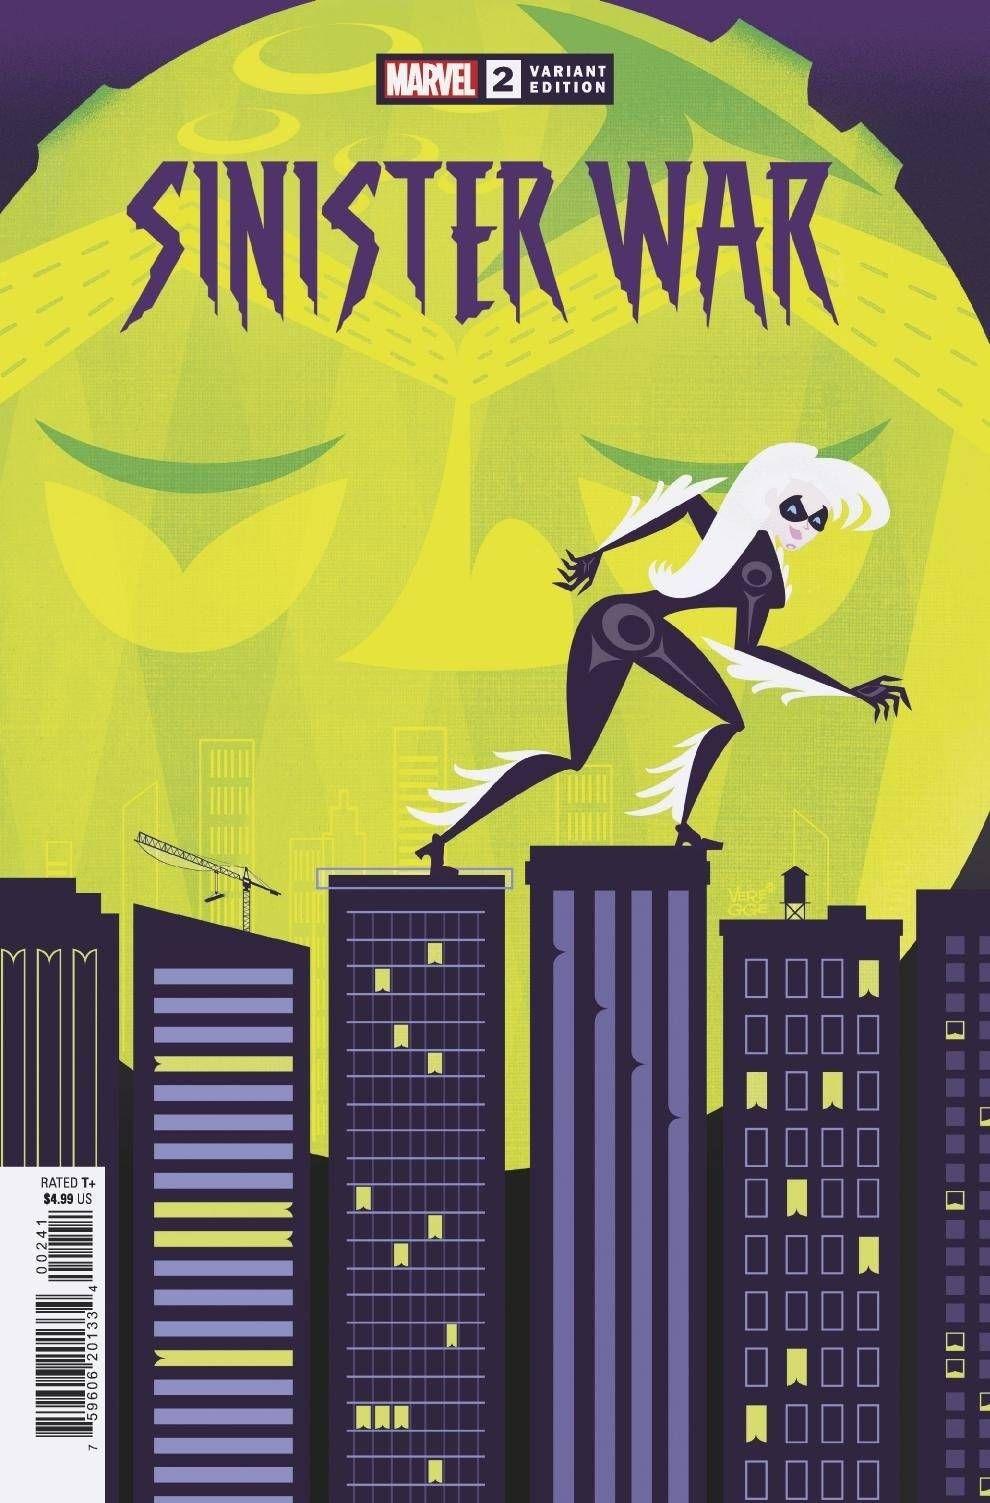 eyJidWNrZXQiOiJnb2NvbGxlY3QuaW1hZ2VzLnB1YiIsImtleSI6IjgxMTg2MTJmLWI0ZjktNDNlNC1hMDc3LWFkMzBkNDY2MzE3Yy5qcGciLCJlZGl0cyI6W119 ComicList: Marvel Comics New Releases for 08/04/2021